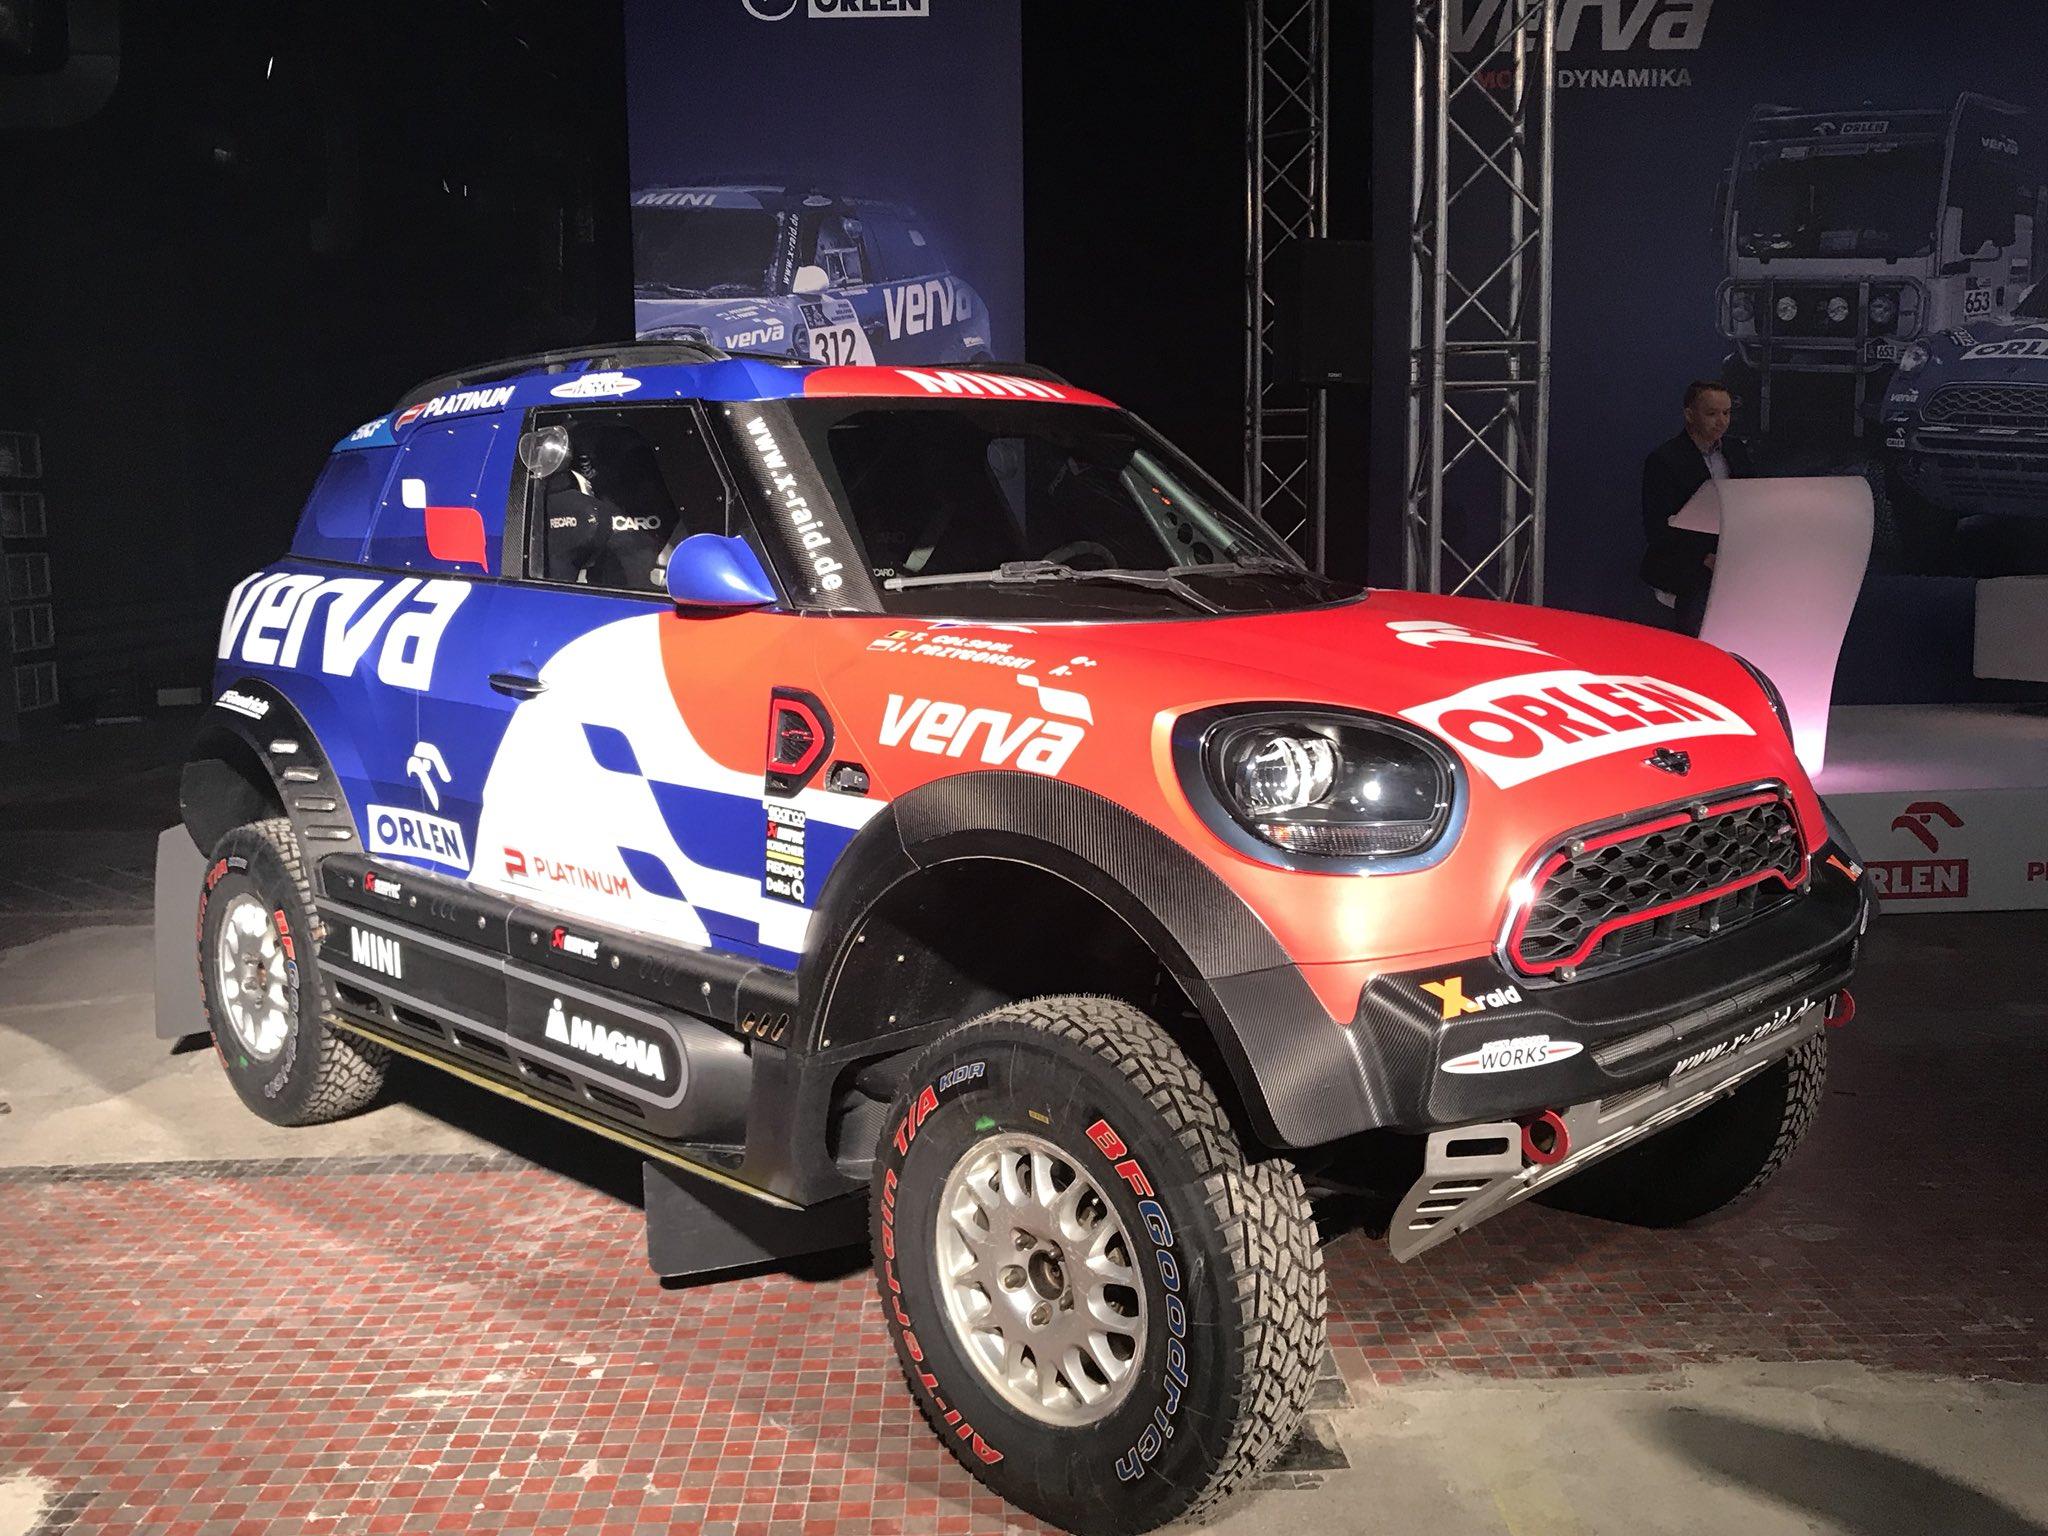 2018 40º Rallye Raid Dakar Perú - Bolivia - Argentina [6-20 Enero] - Página 2 DQ1tHTYWkAUE4MZ